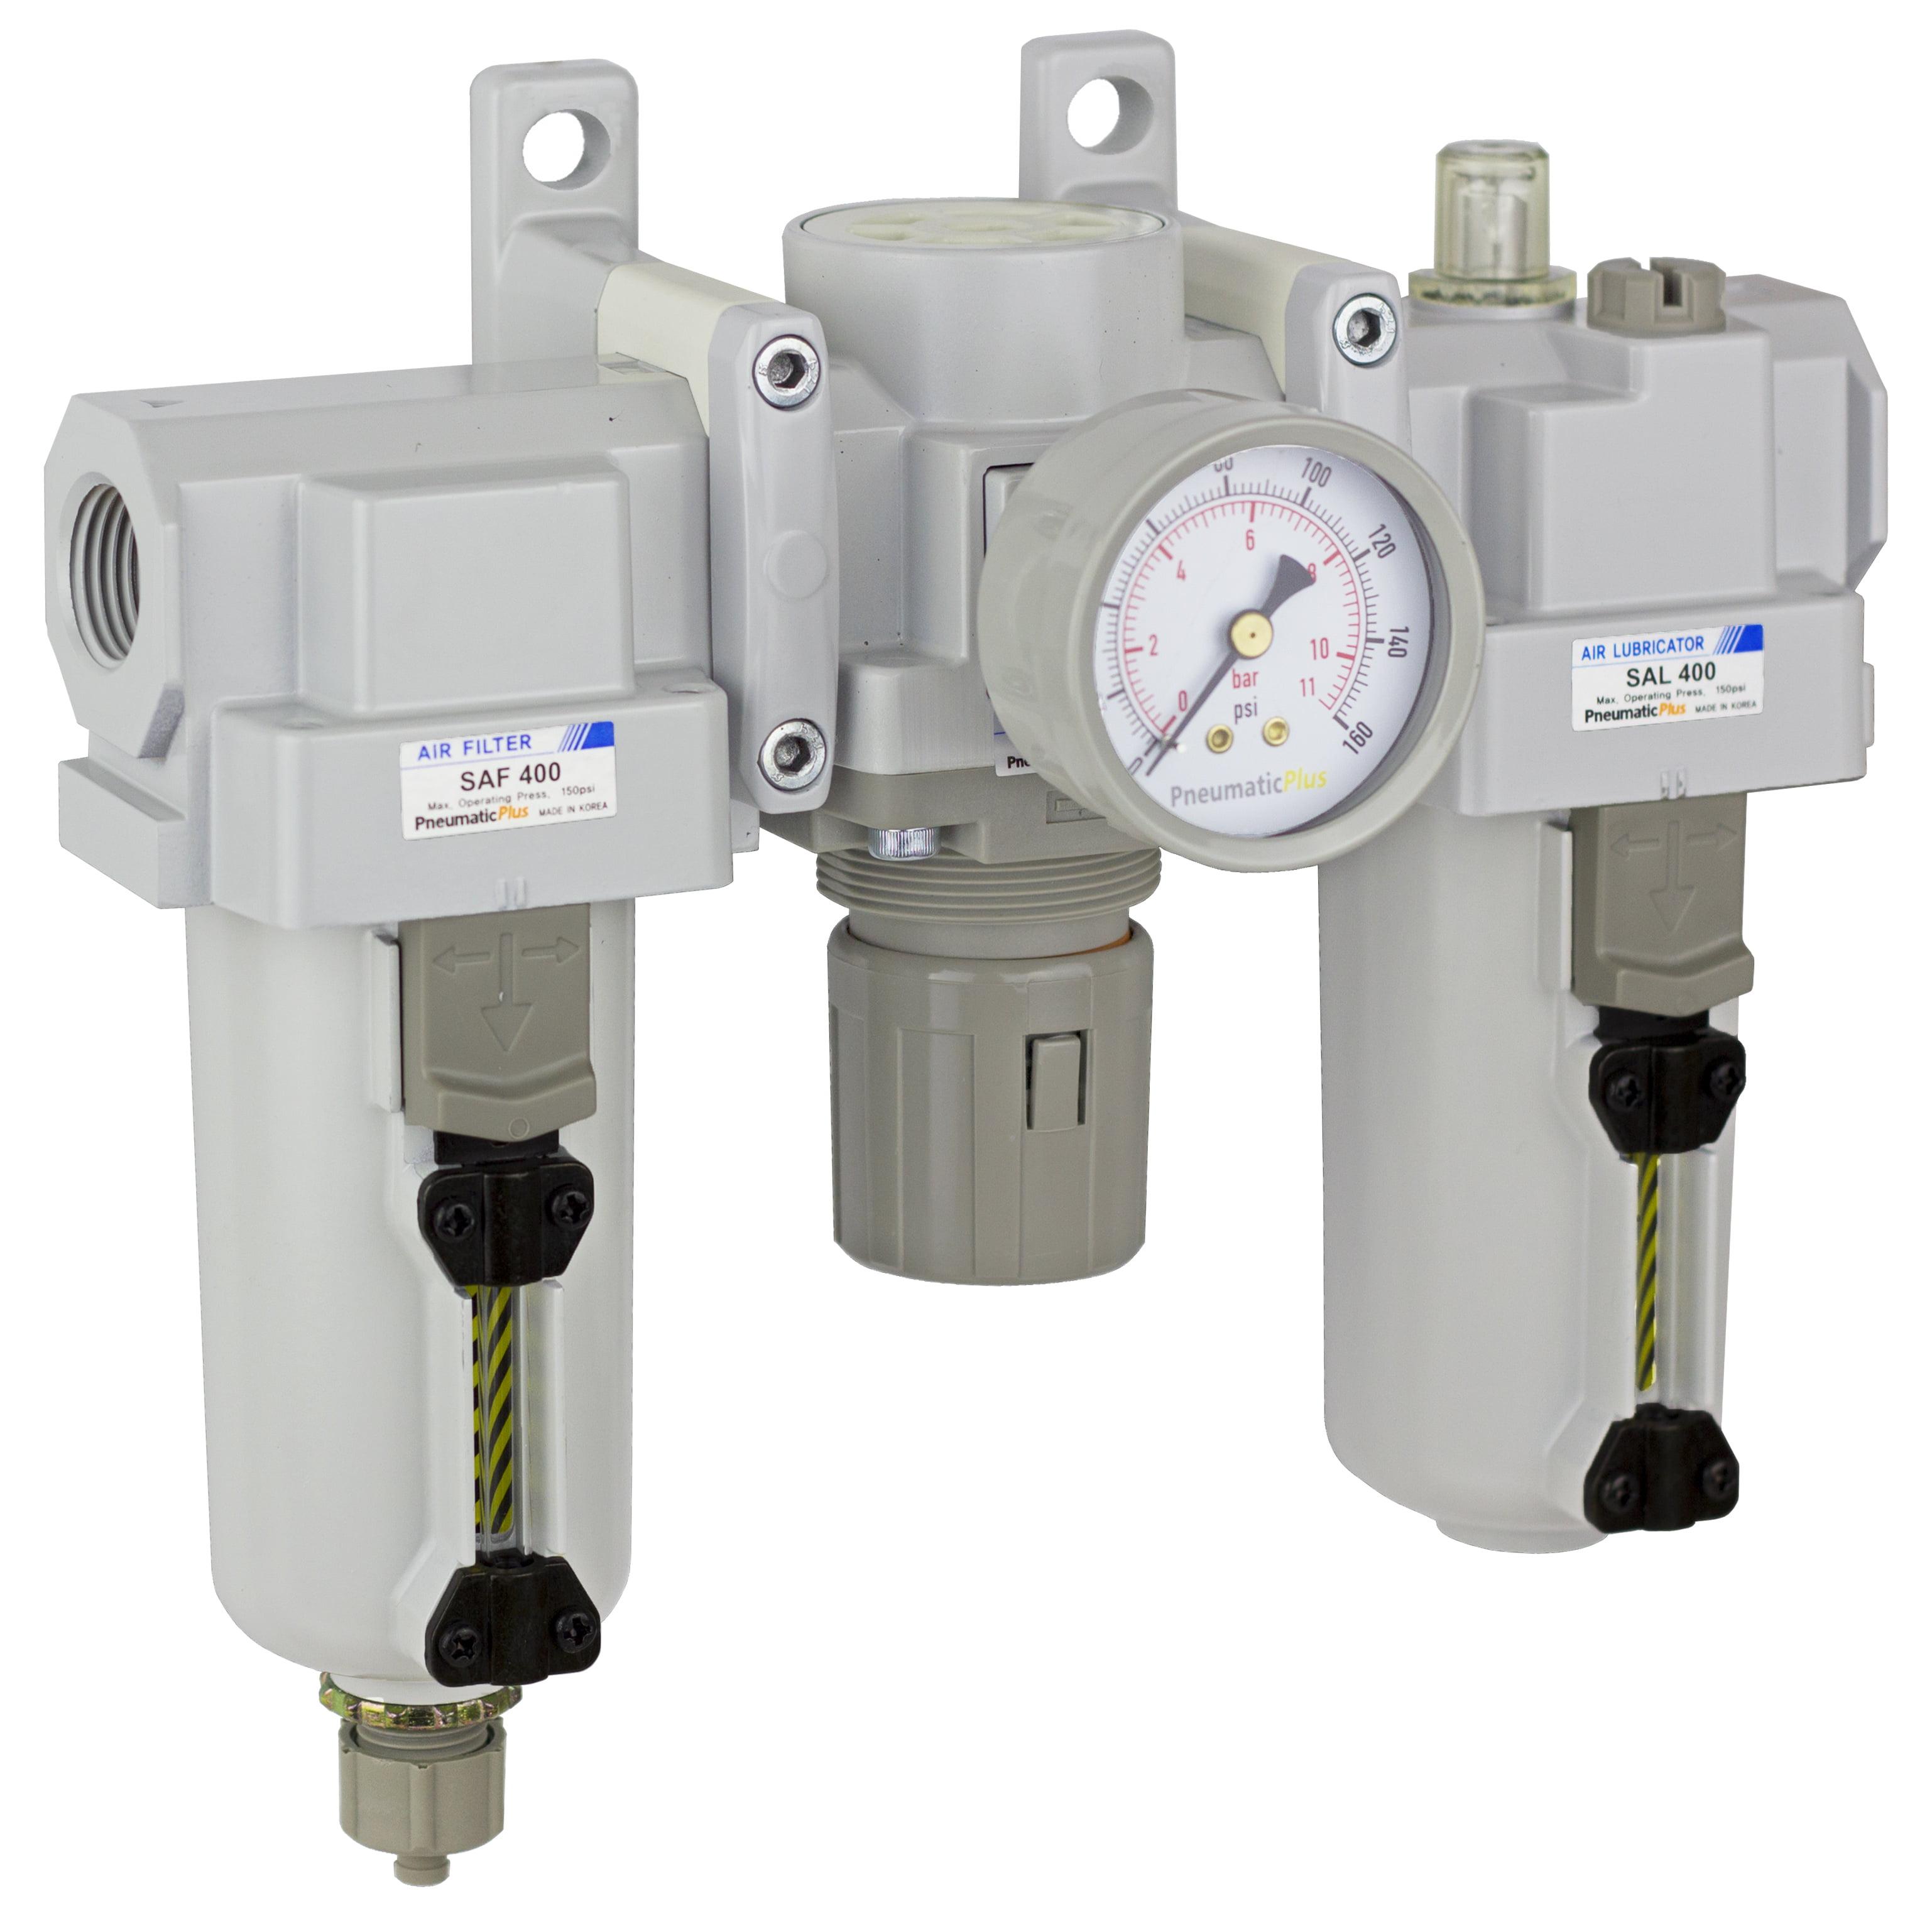 GLOSS Compressor Air filter regulator and lubricator Water Condensate Trap Tool